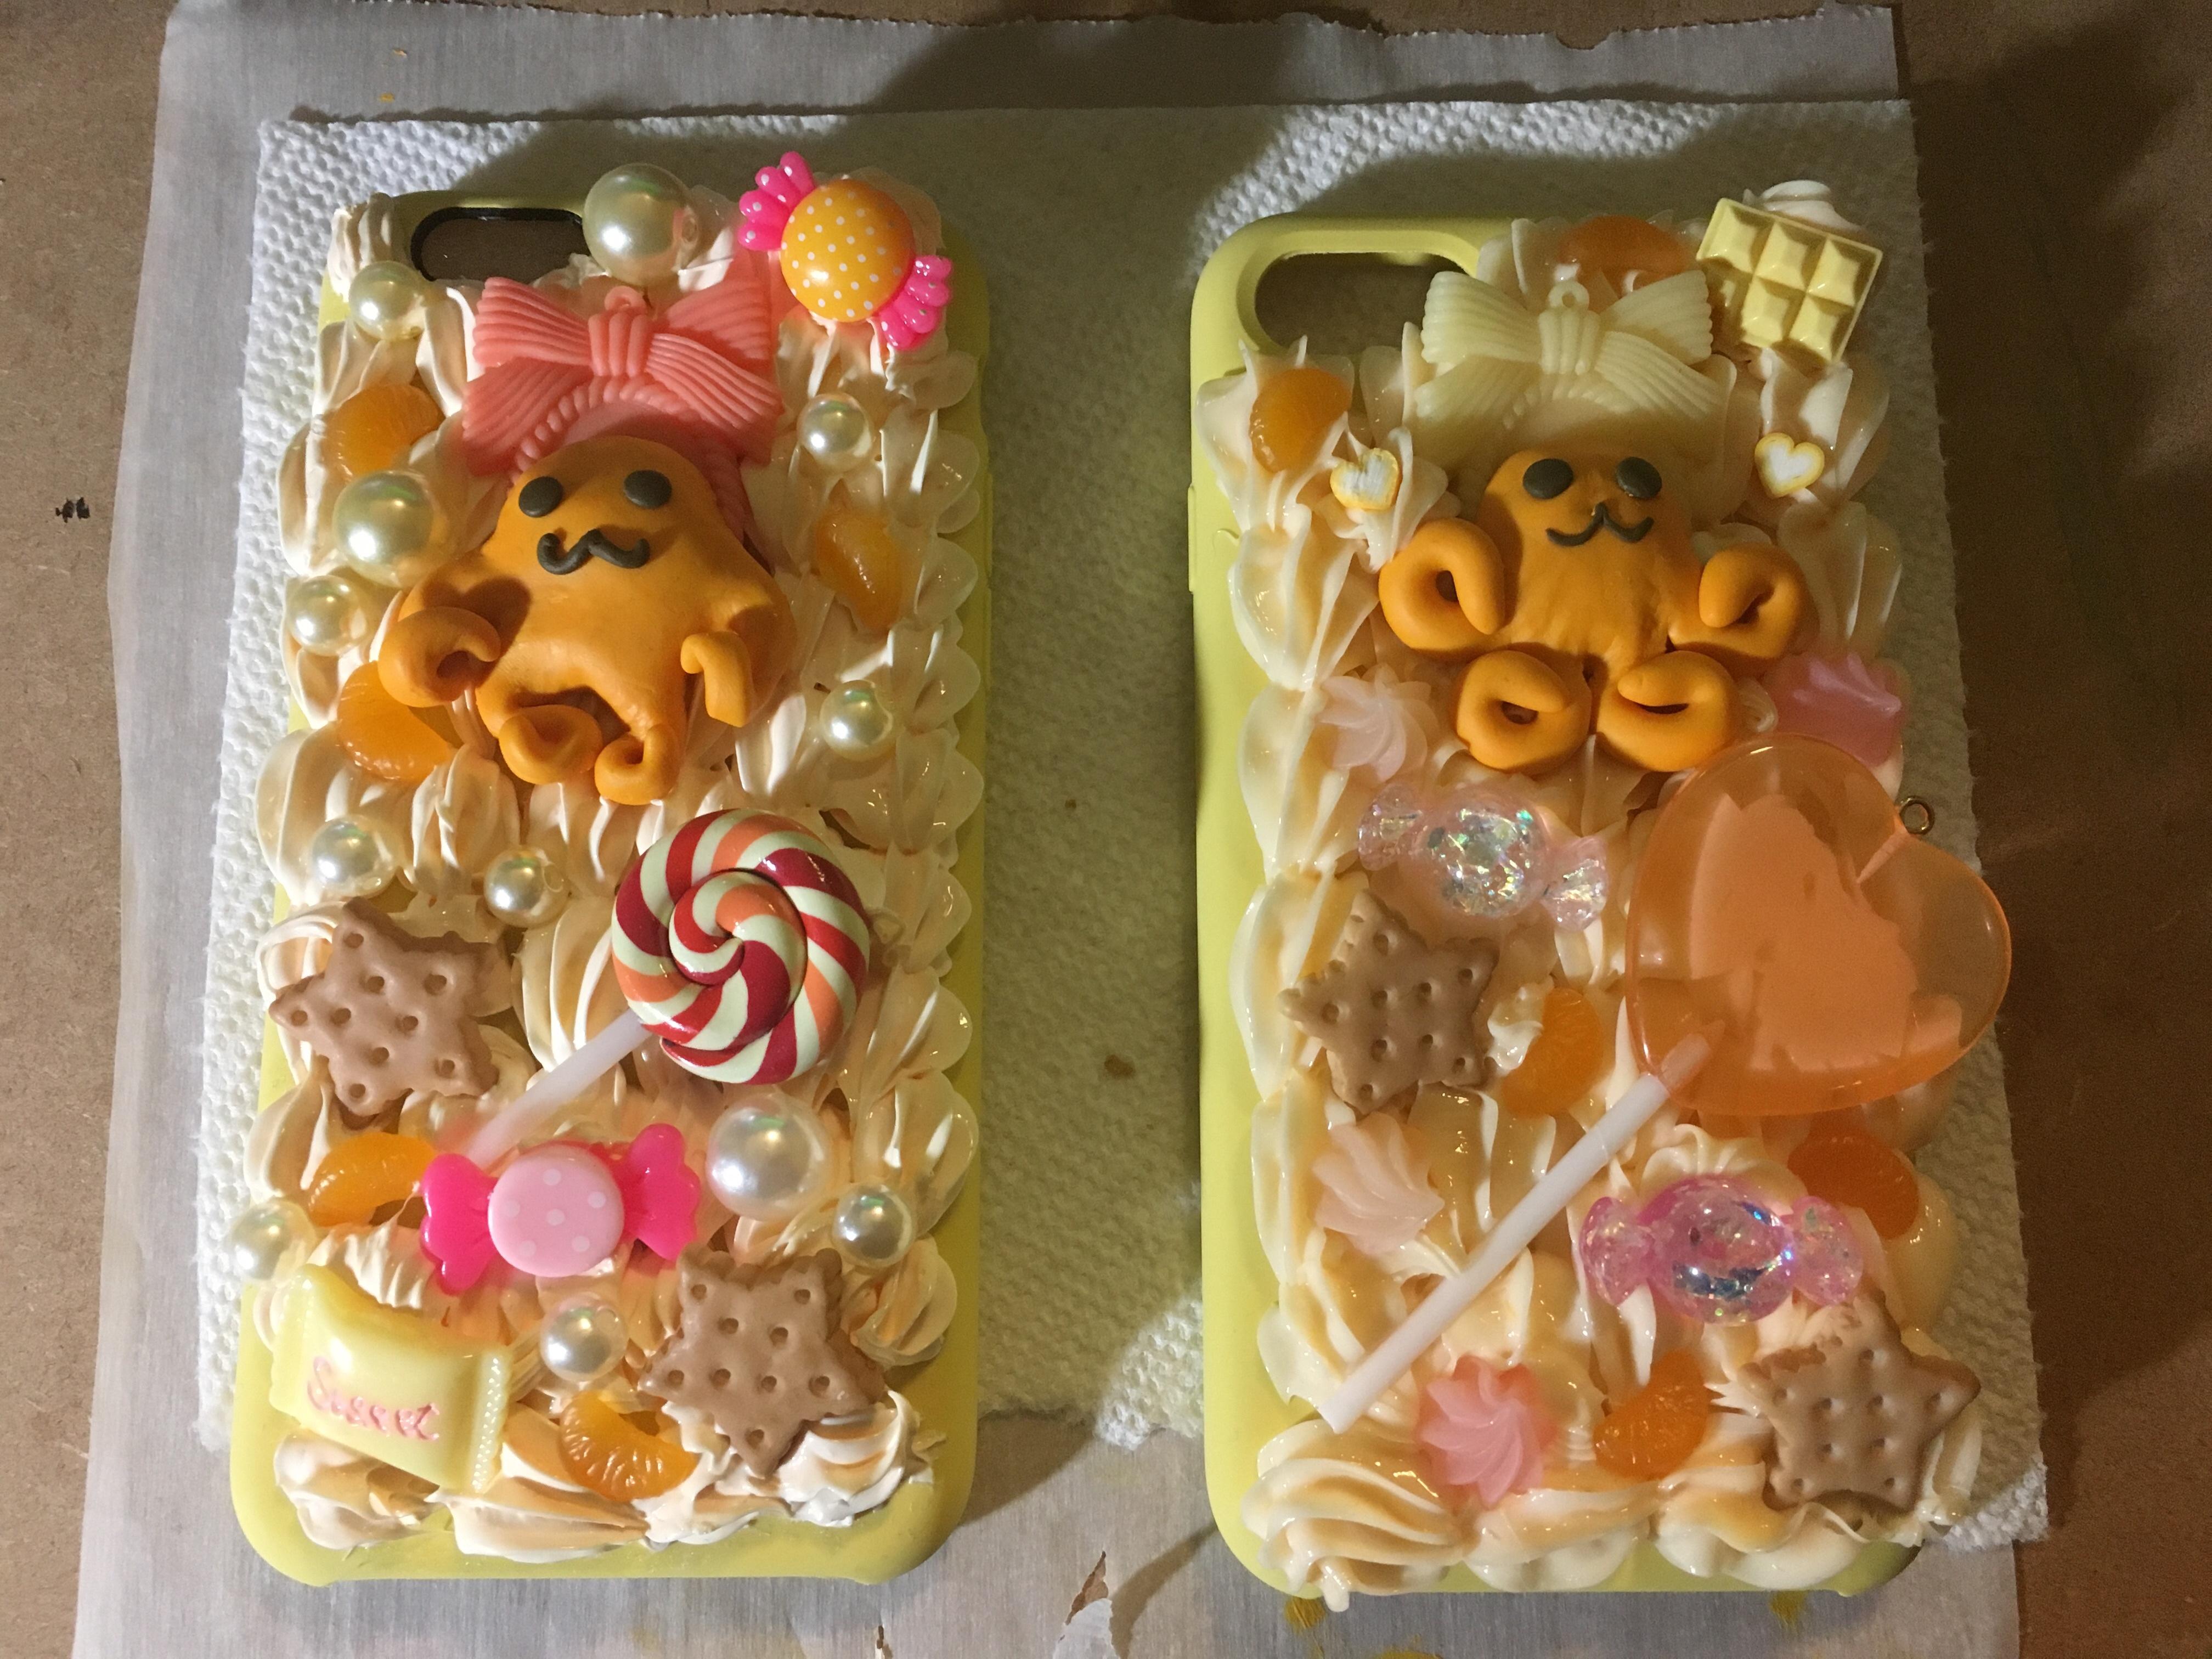 999_phone_cases.jpg